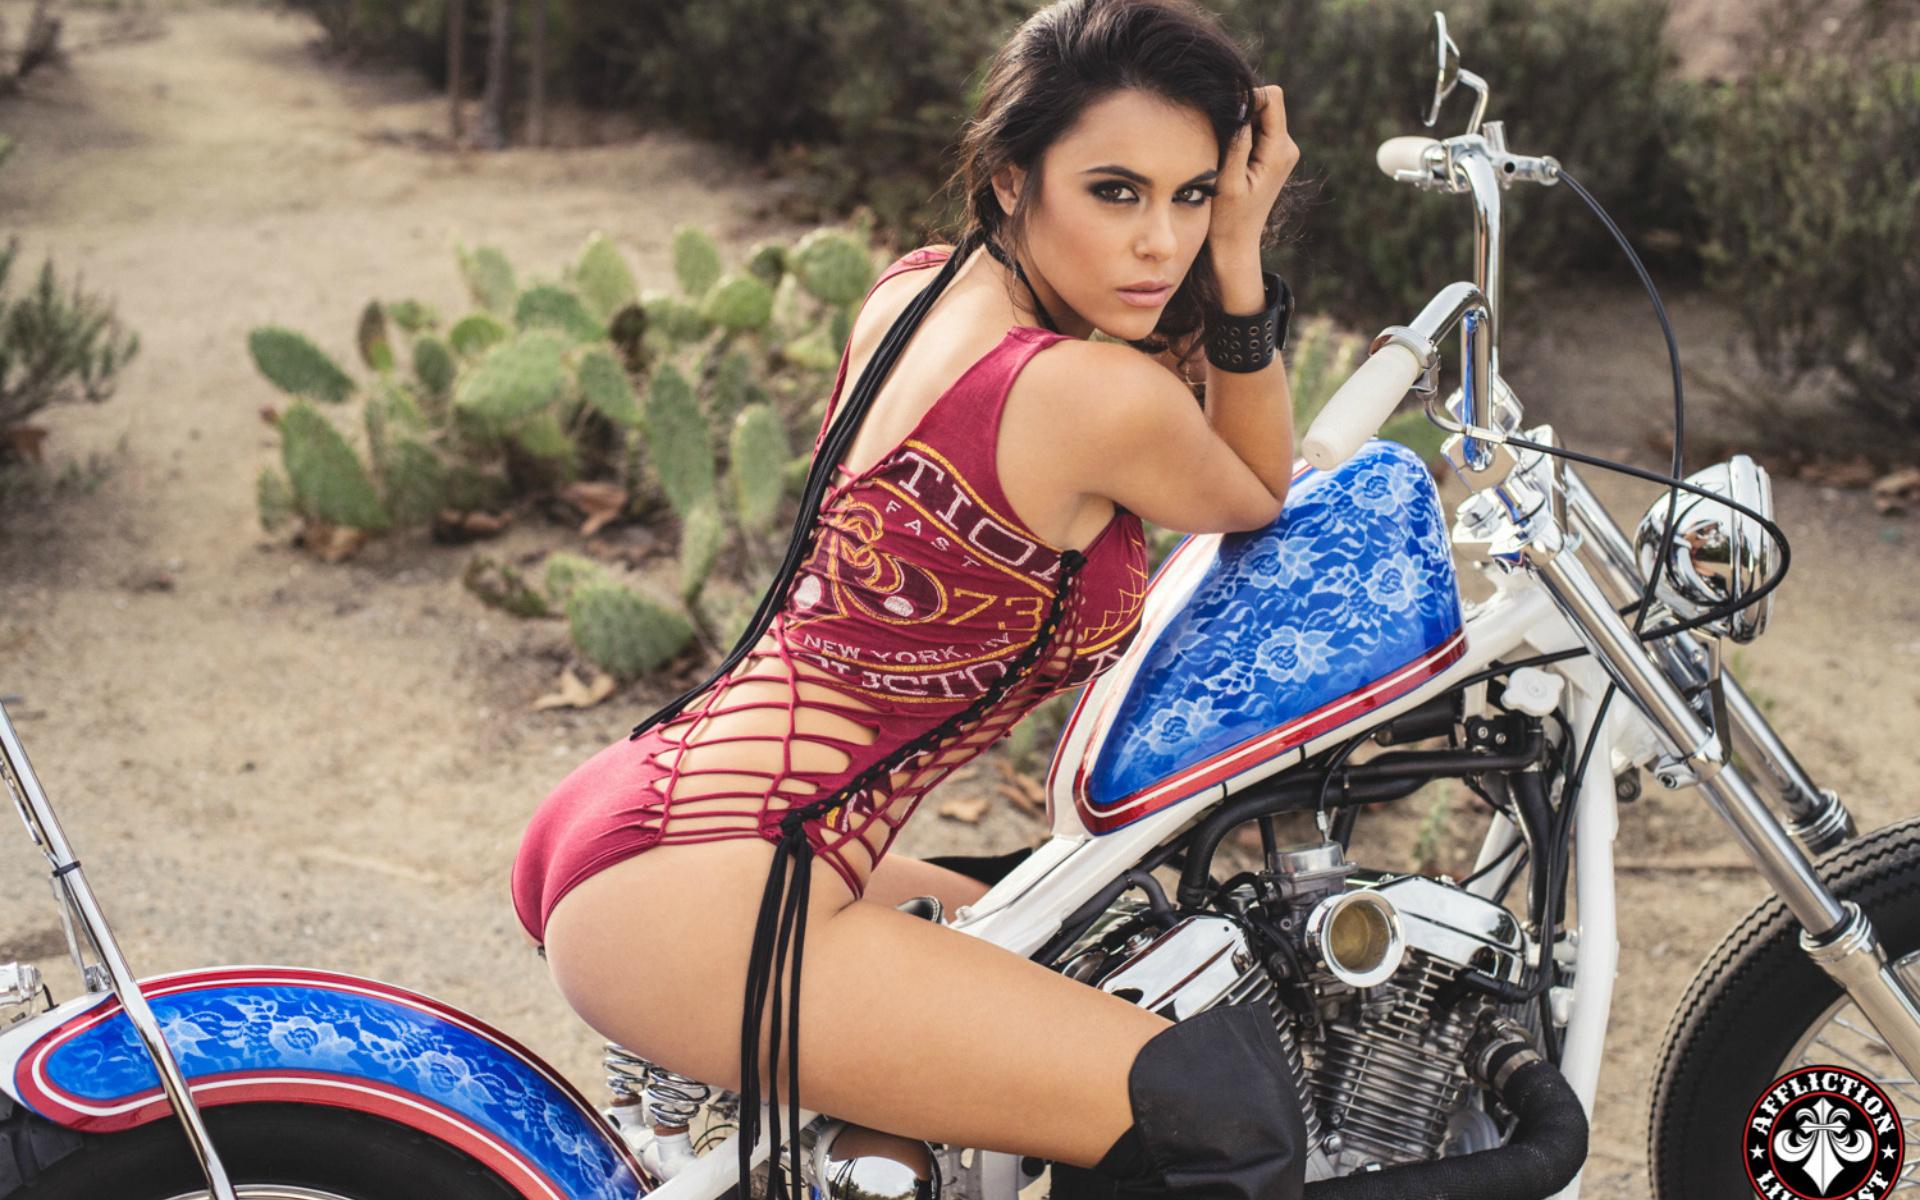 Babes boobs and bike affairs